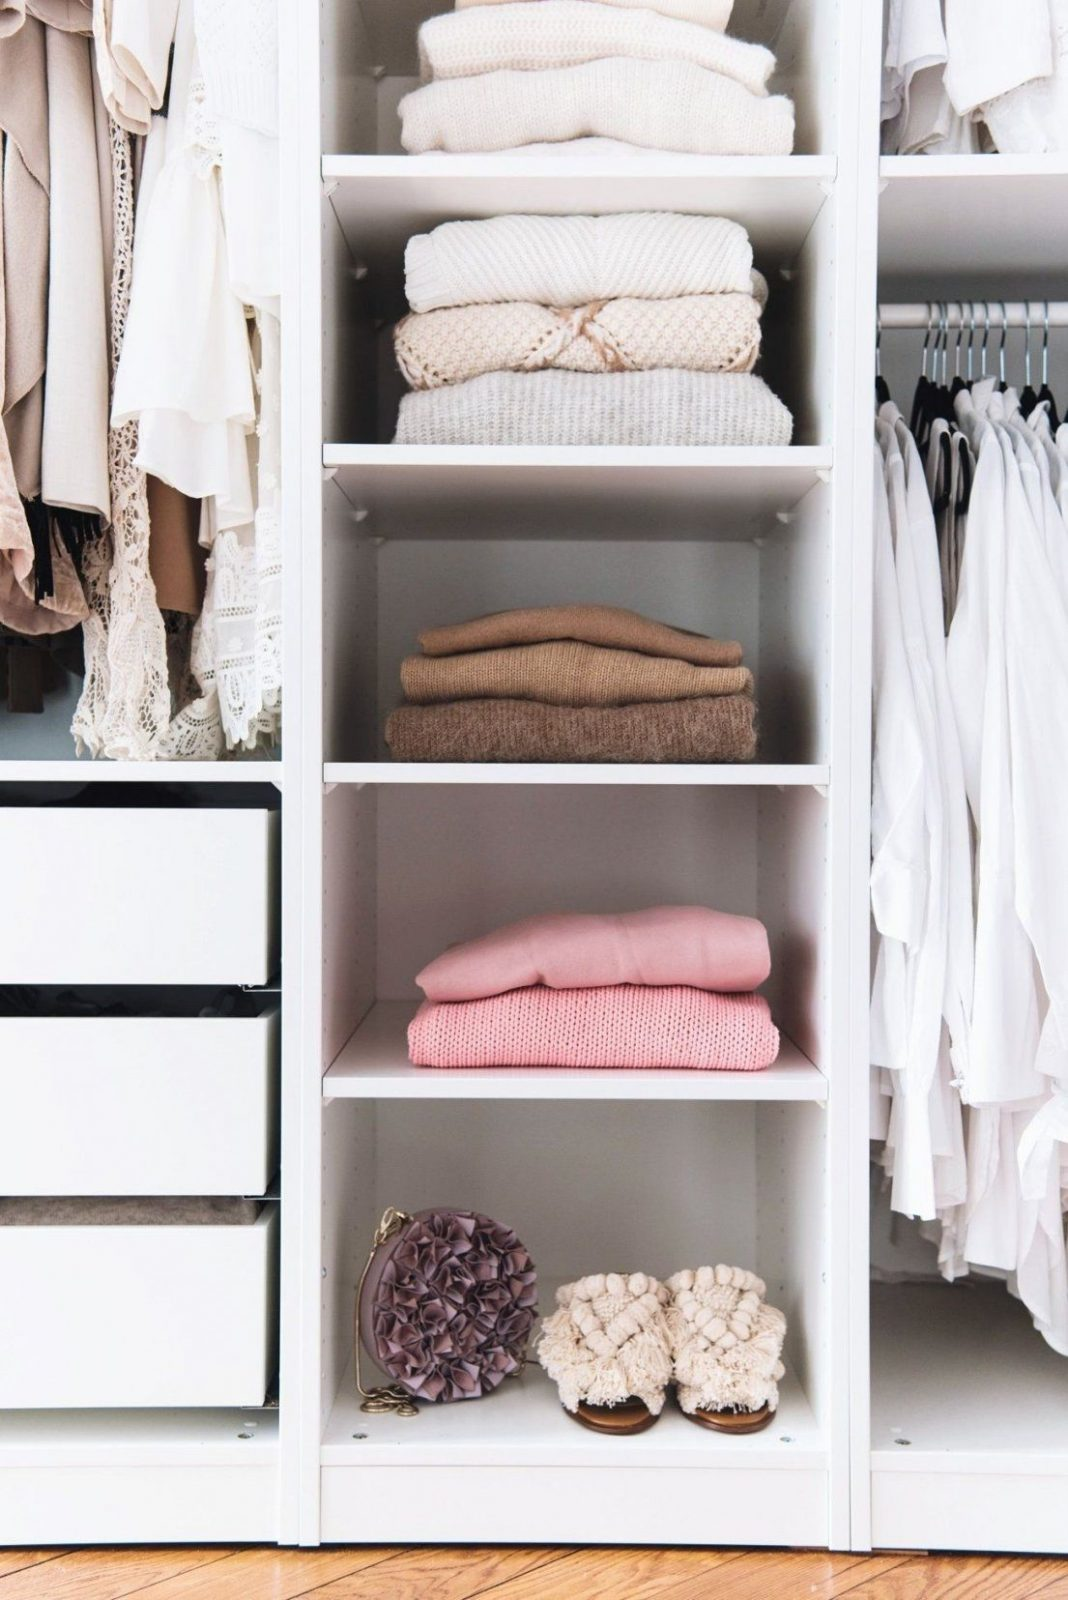 Kleiderschrank Selber Bauen Cute Design Bezieht Sich Auf von Begehbarer Kleiderschrank Selber Bauen Anleitung Photo